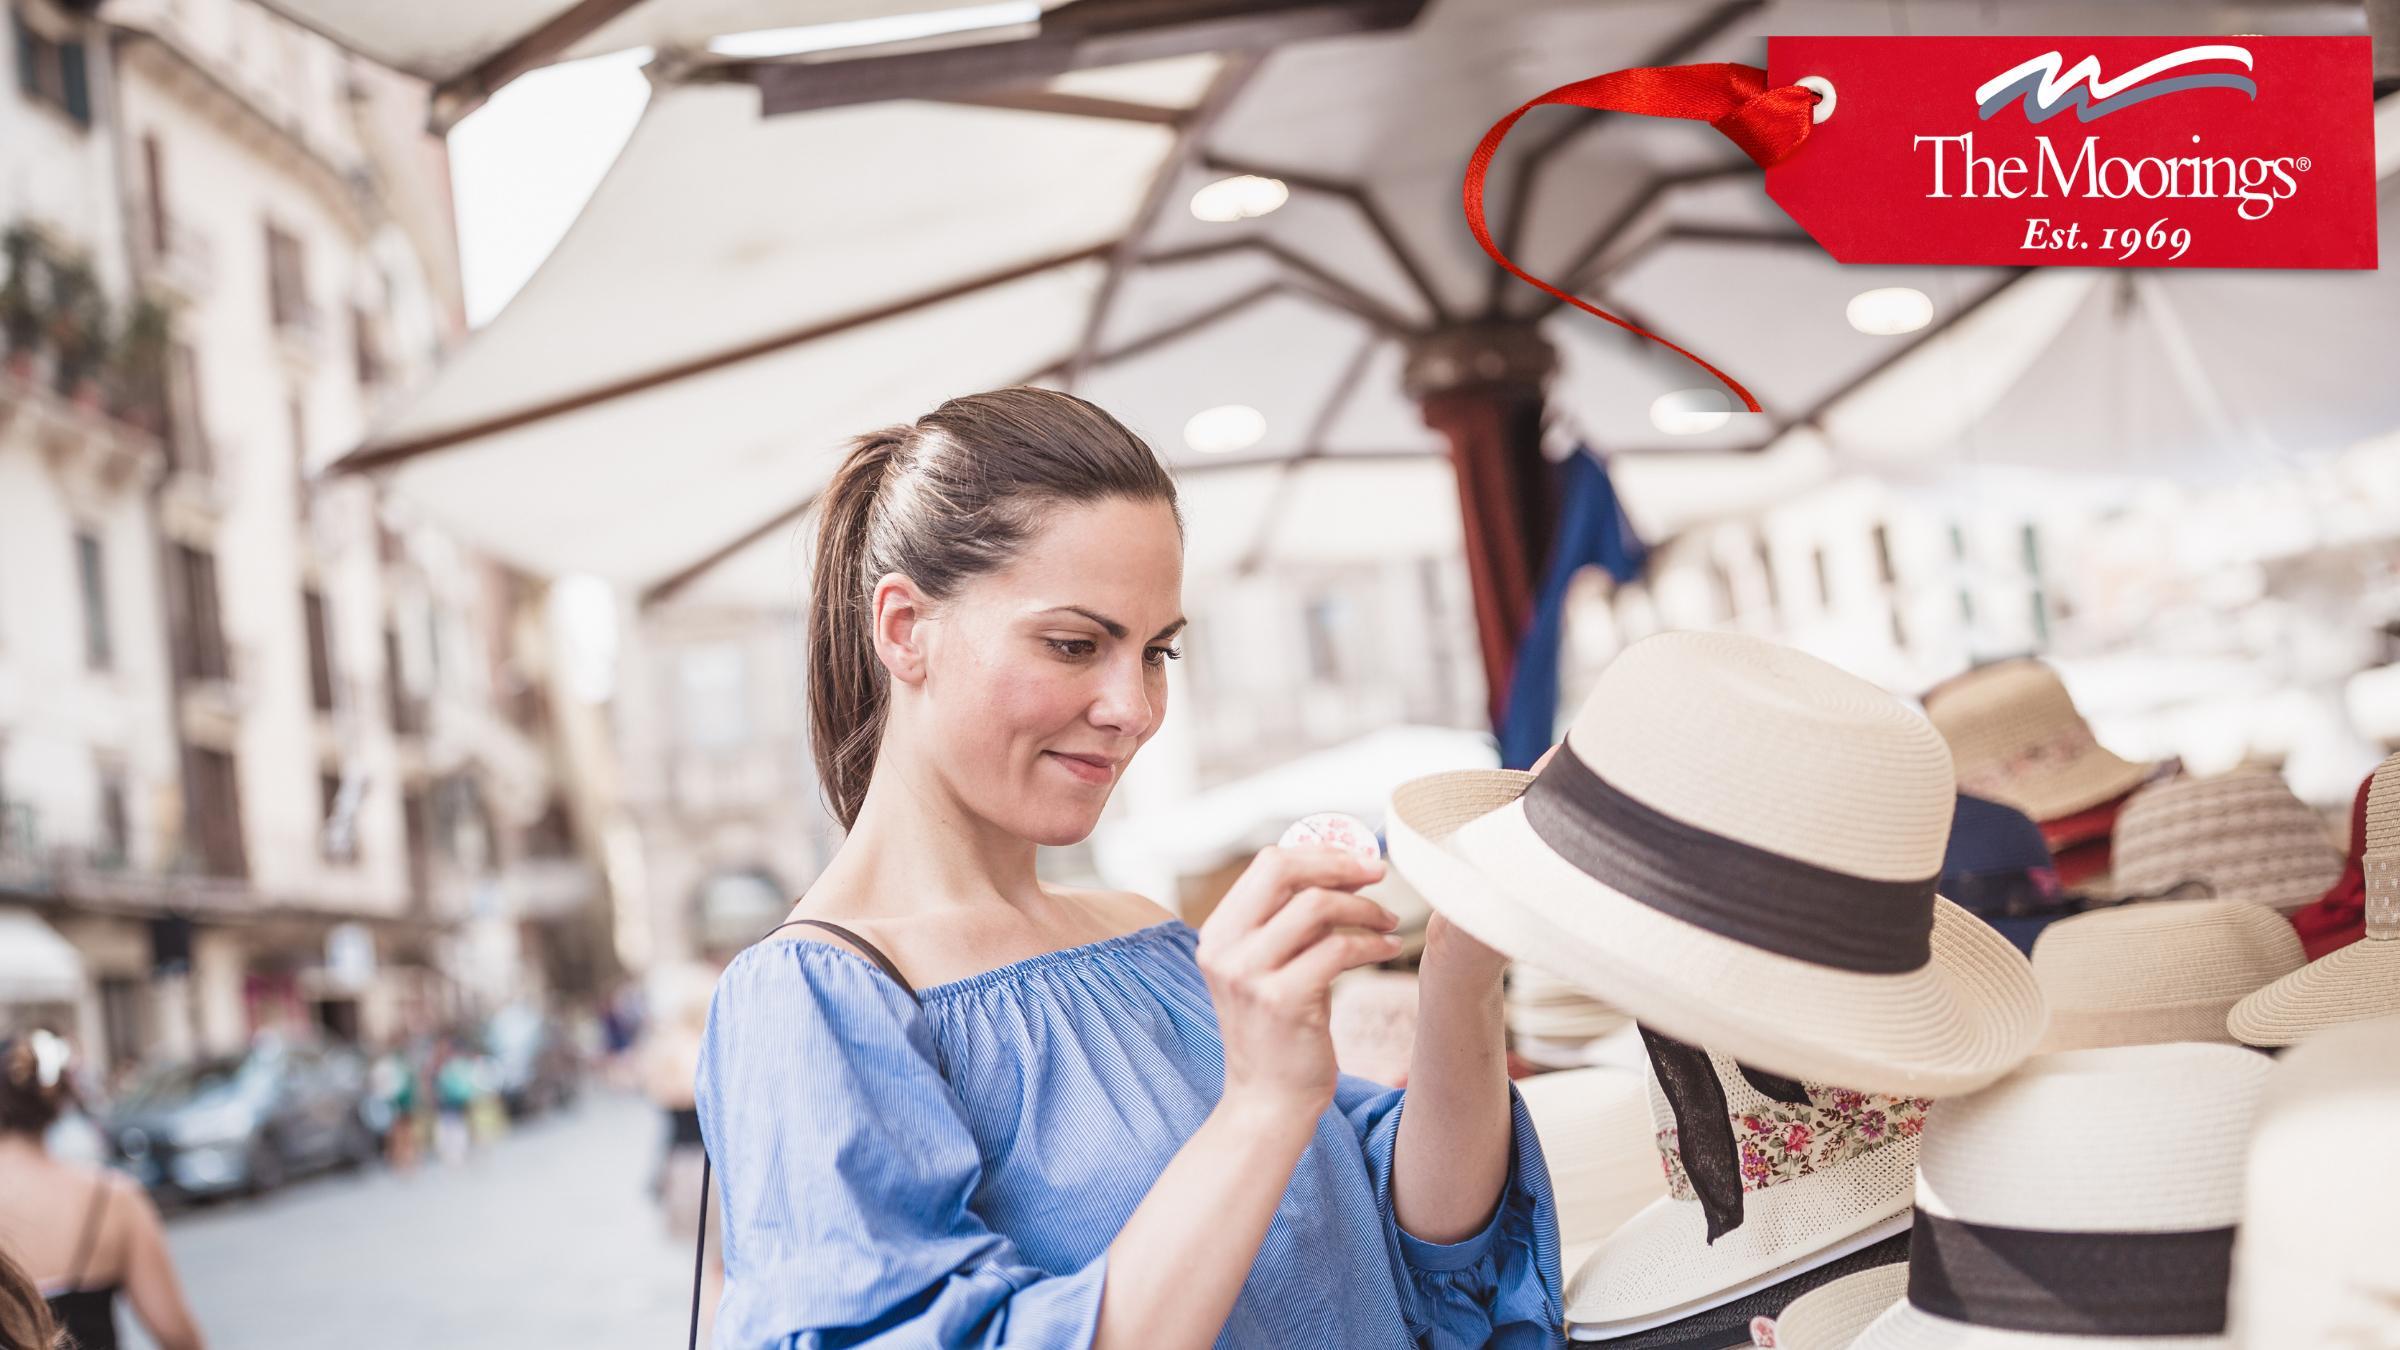 boutique-shopper_2400x1350-web.jpg?t=1OjTx&itok=DuMTqNSF